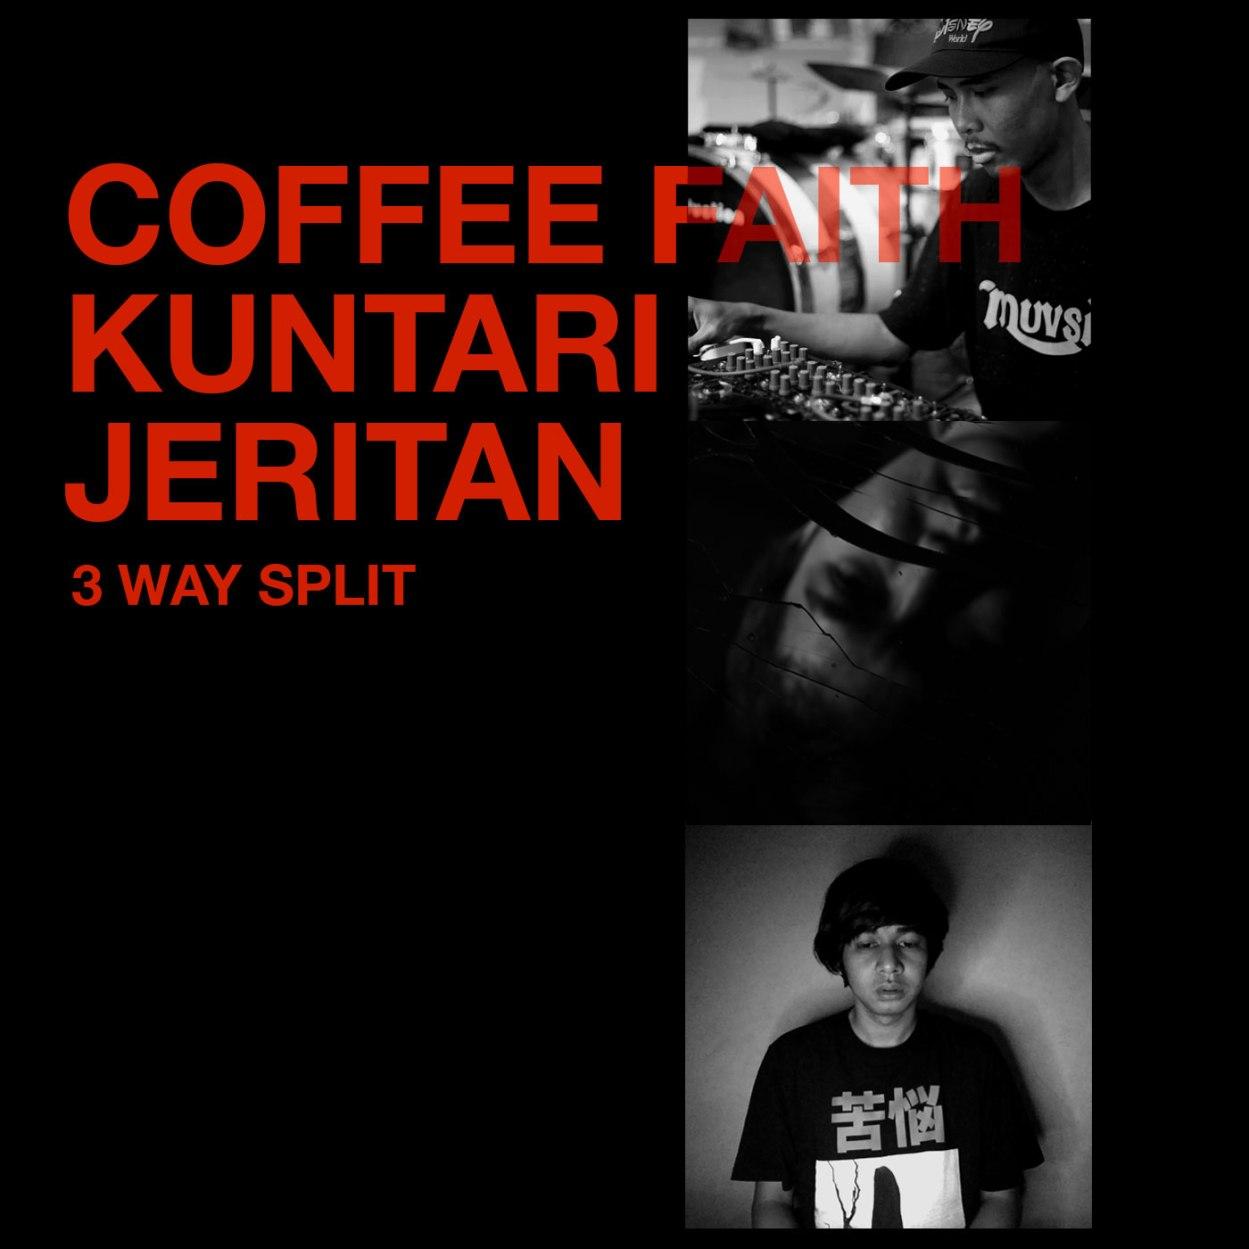 Coffee Faith Kuntari Jeritan – 3 Way Split